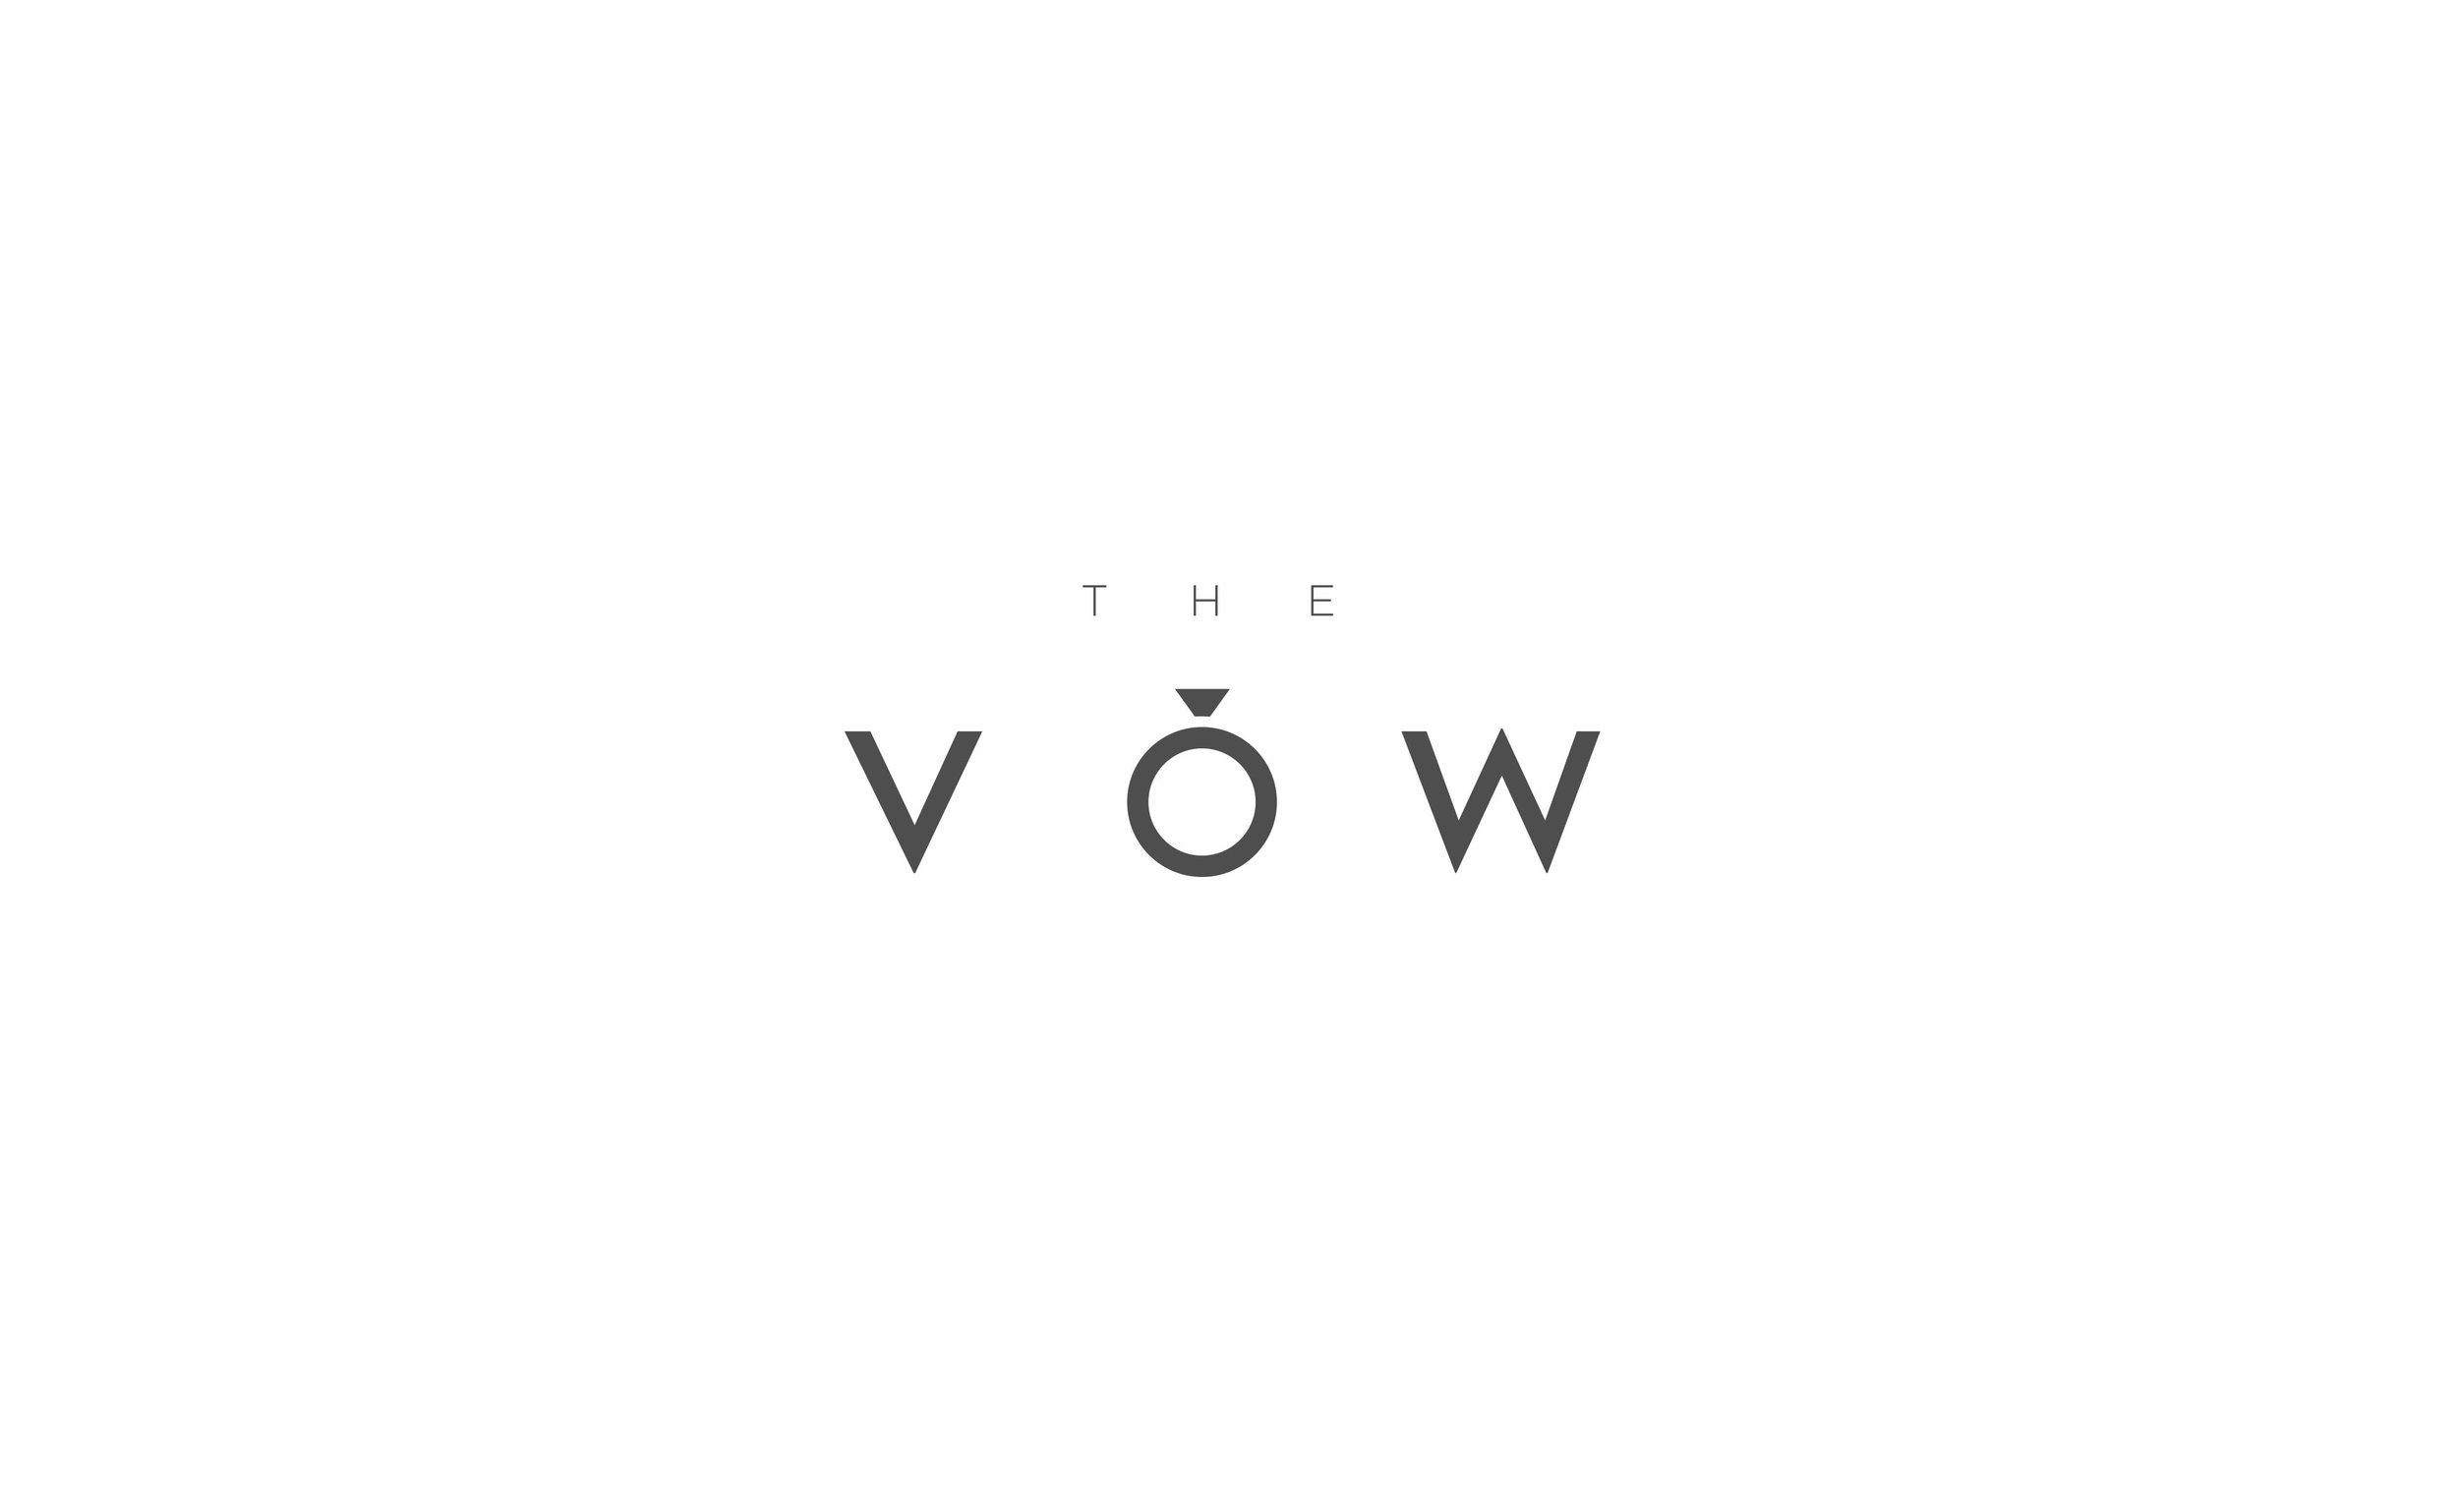 TheVow_Artwork (1).jpg